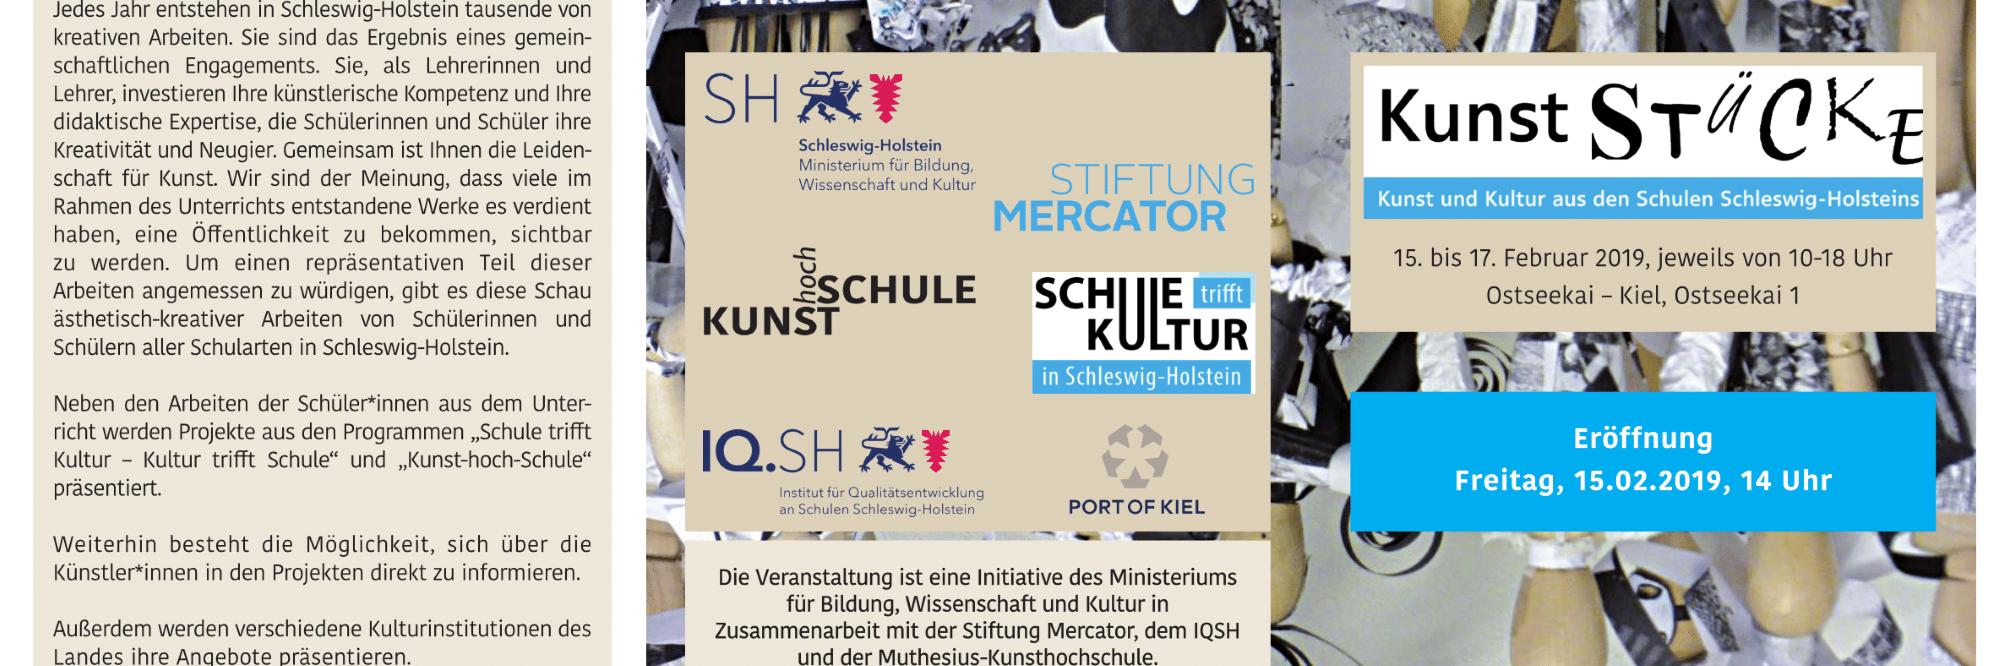 Kunststücke in Kiel